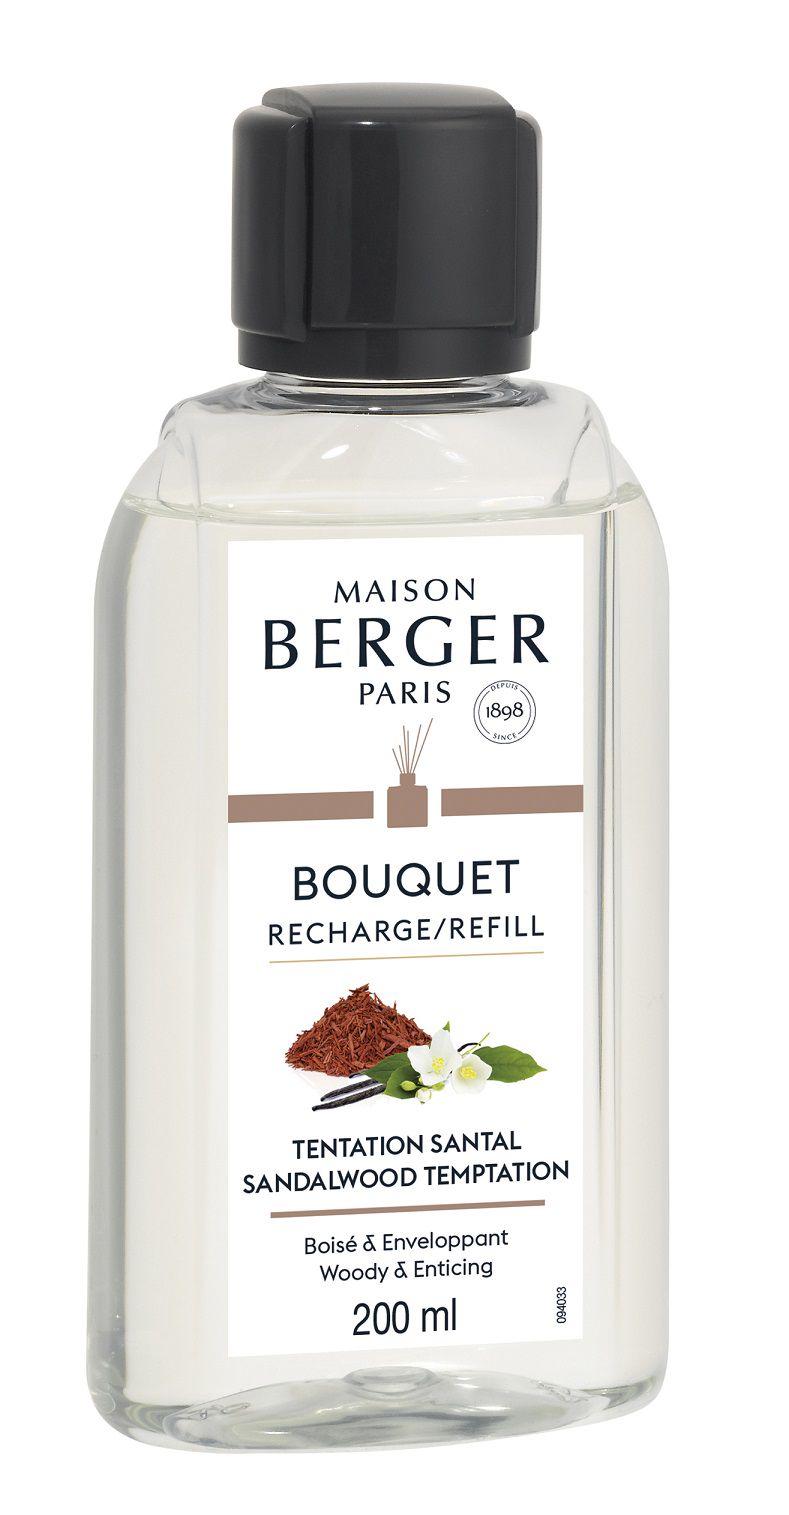 Maison Berger Navulling Sandalwood Temptation 200 ml